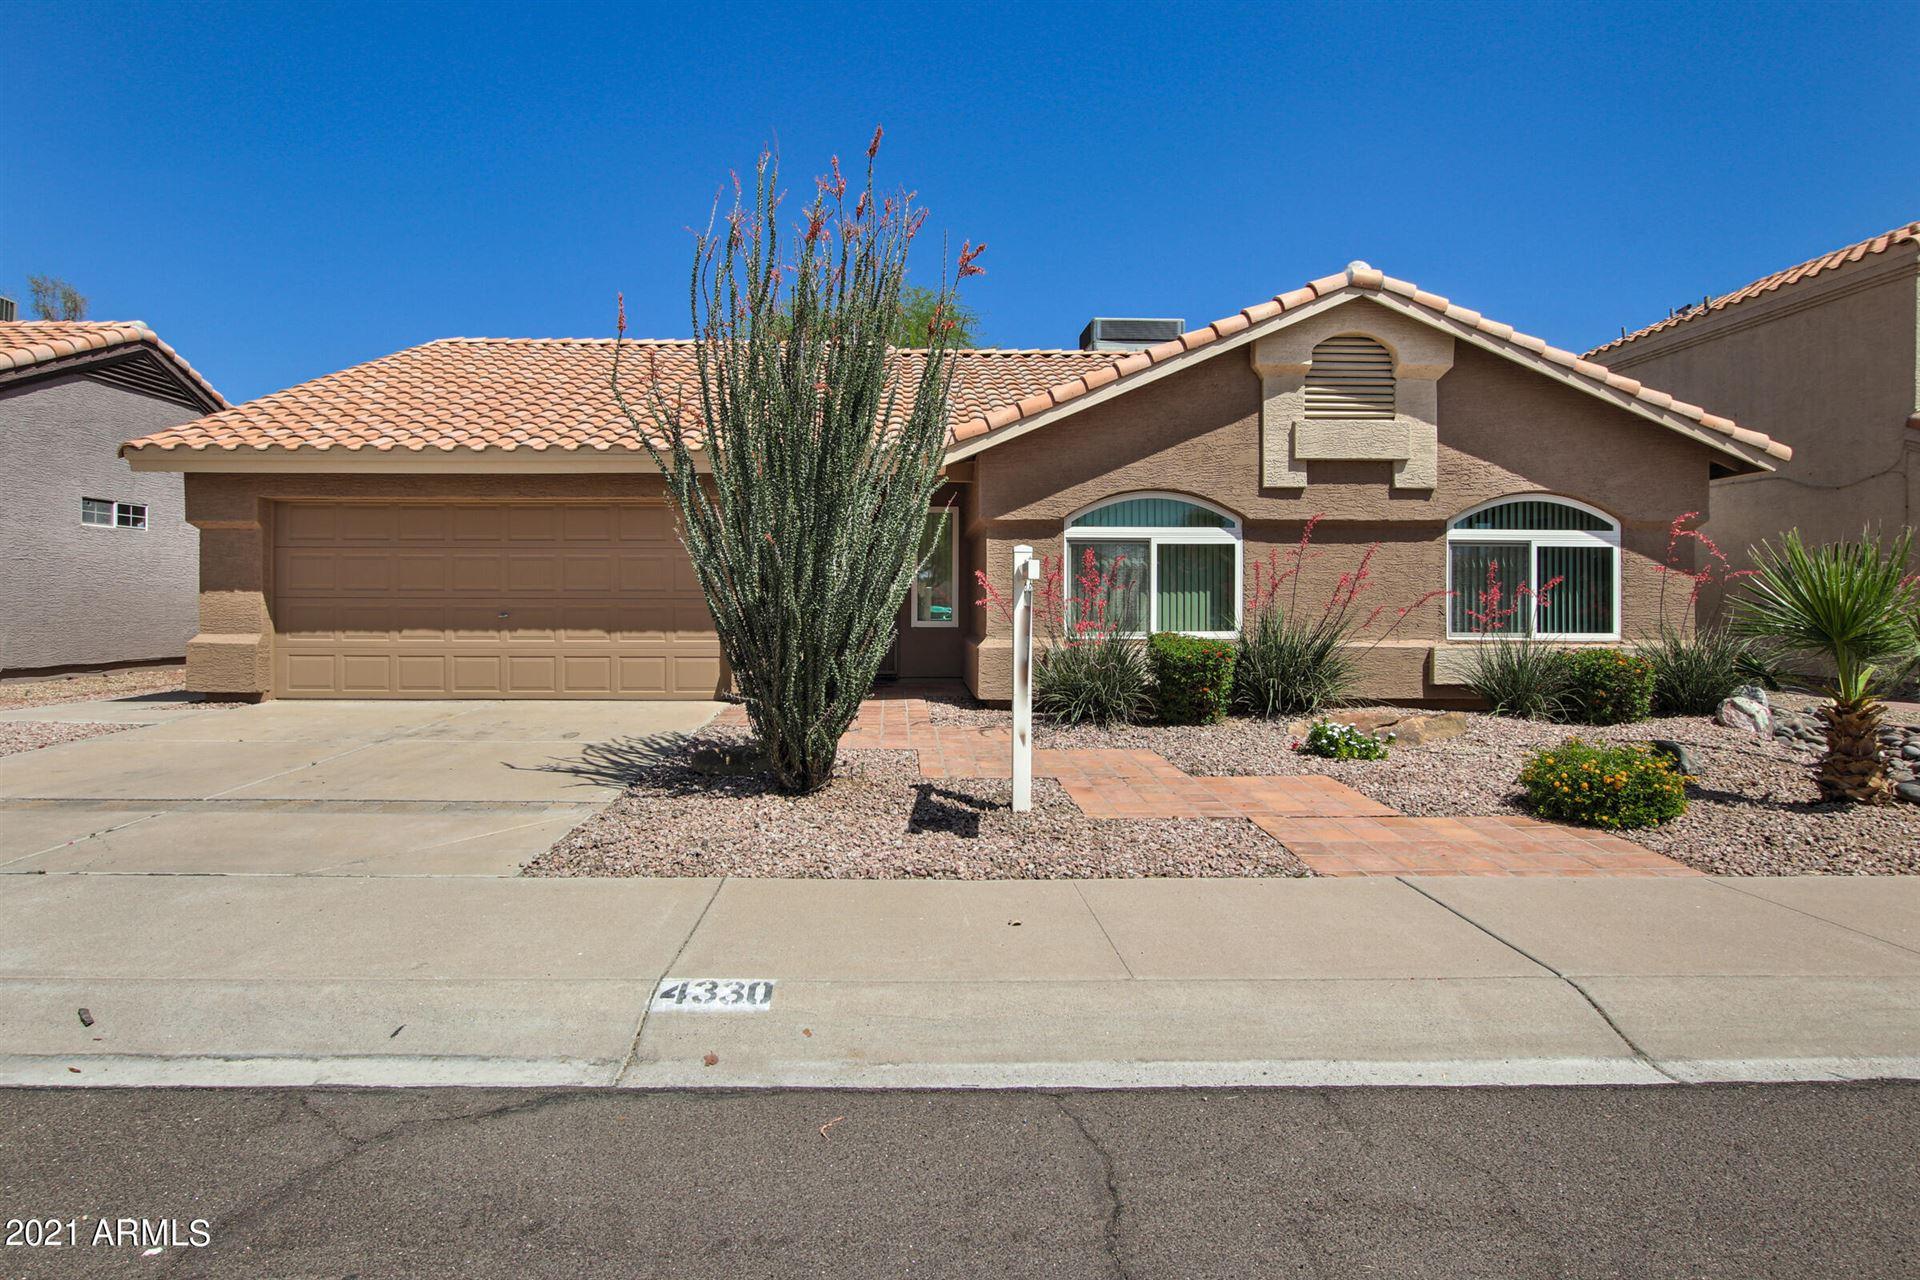 4330 E WINDMERE Drive, Phoenix, AZ 85048 - MLS#: 6230785